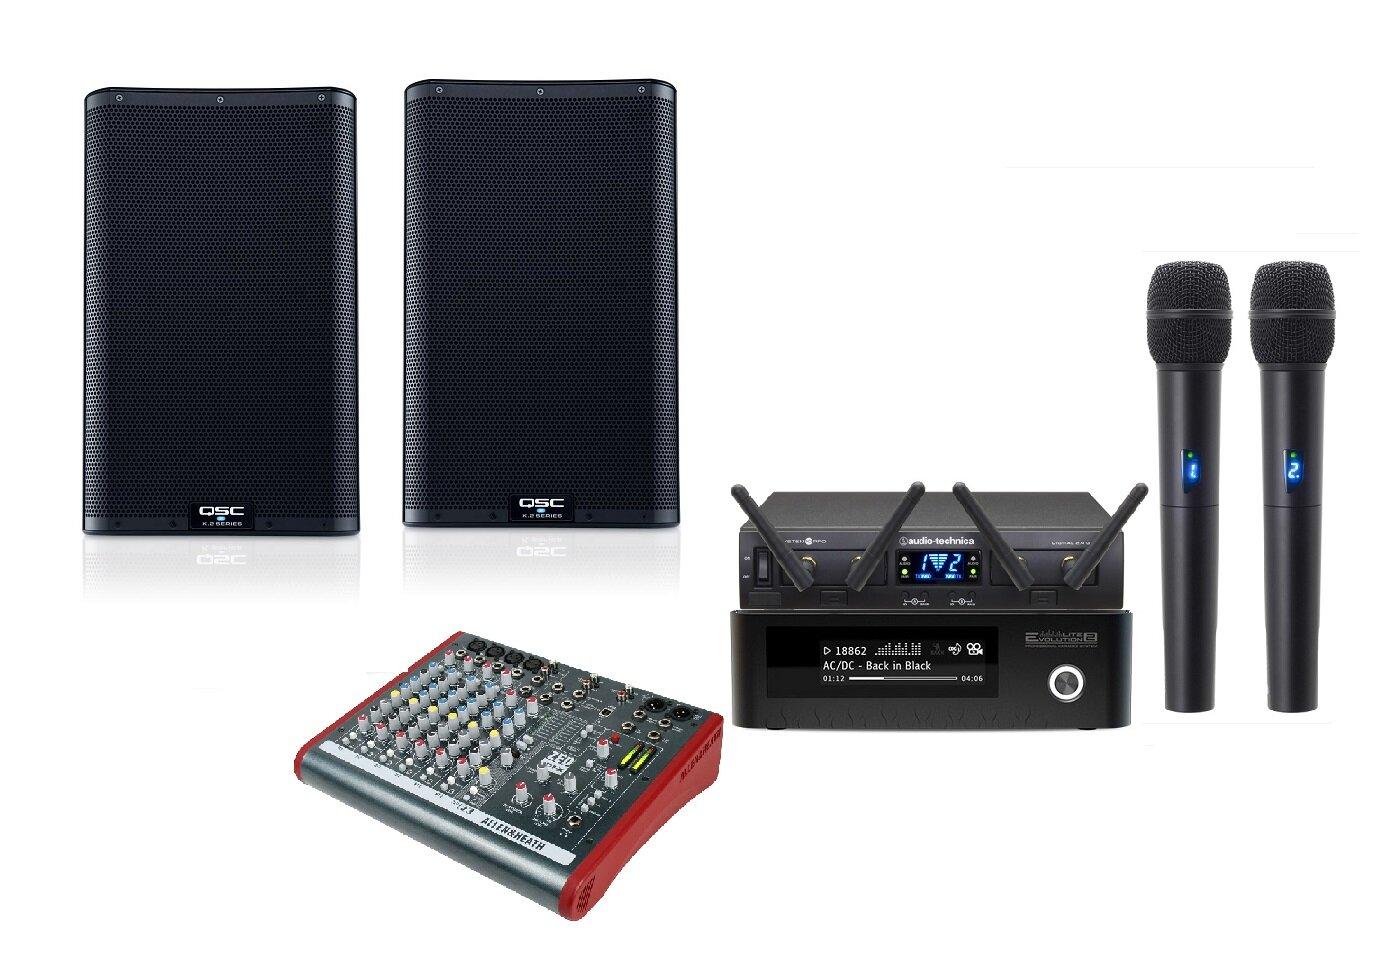 Караоке - комплект для дома Evolution Lite 2 Plus с микрофонами Audio-Technica ATW-1322, микшером и колонками QSC K10.2